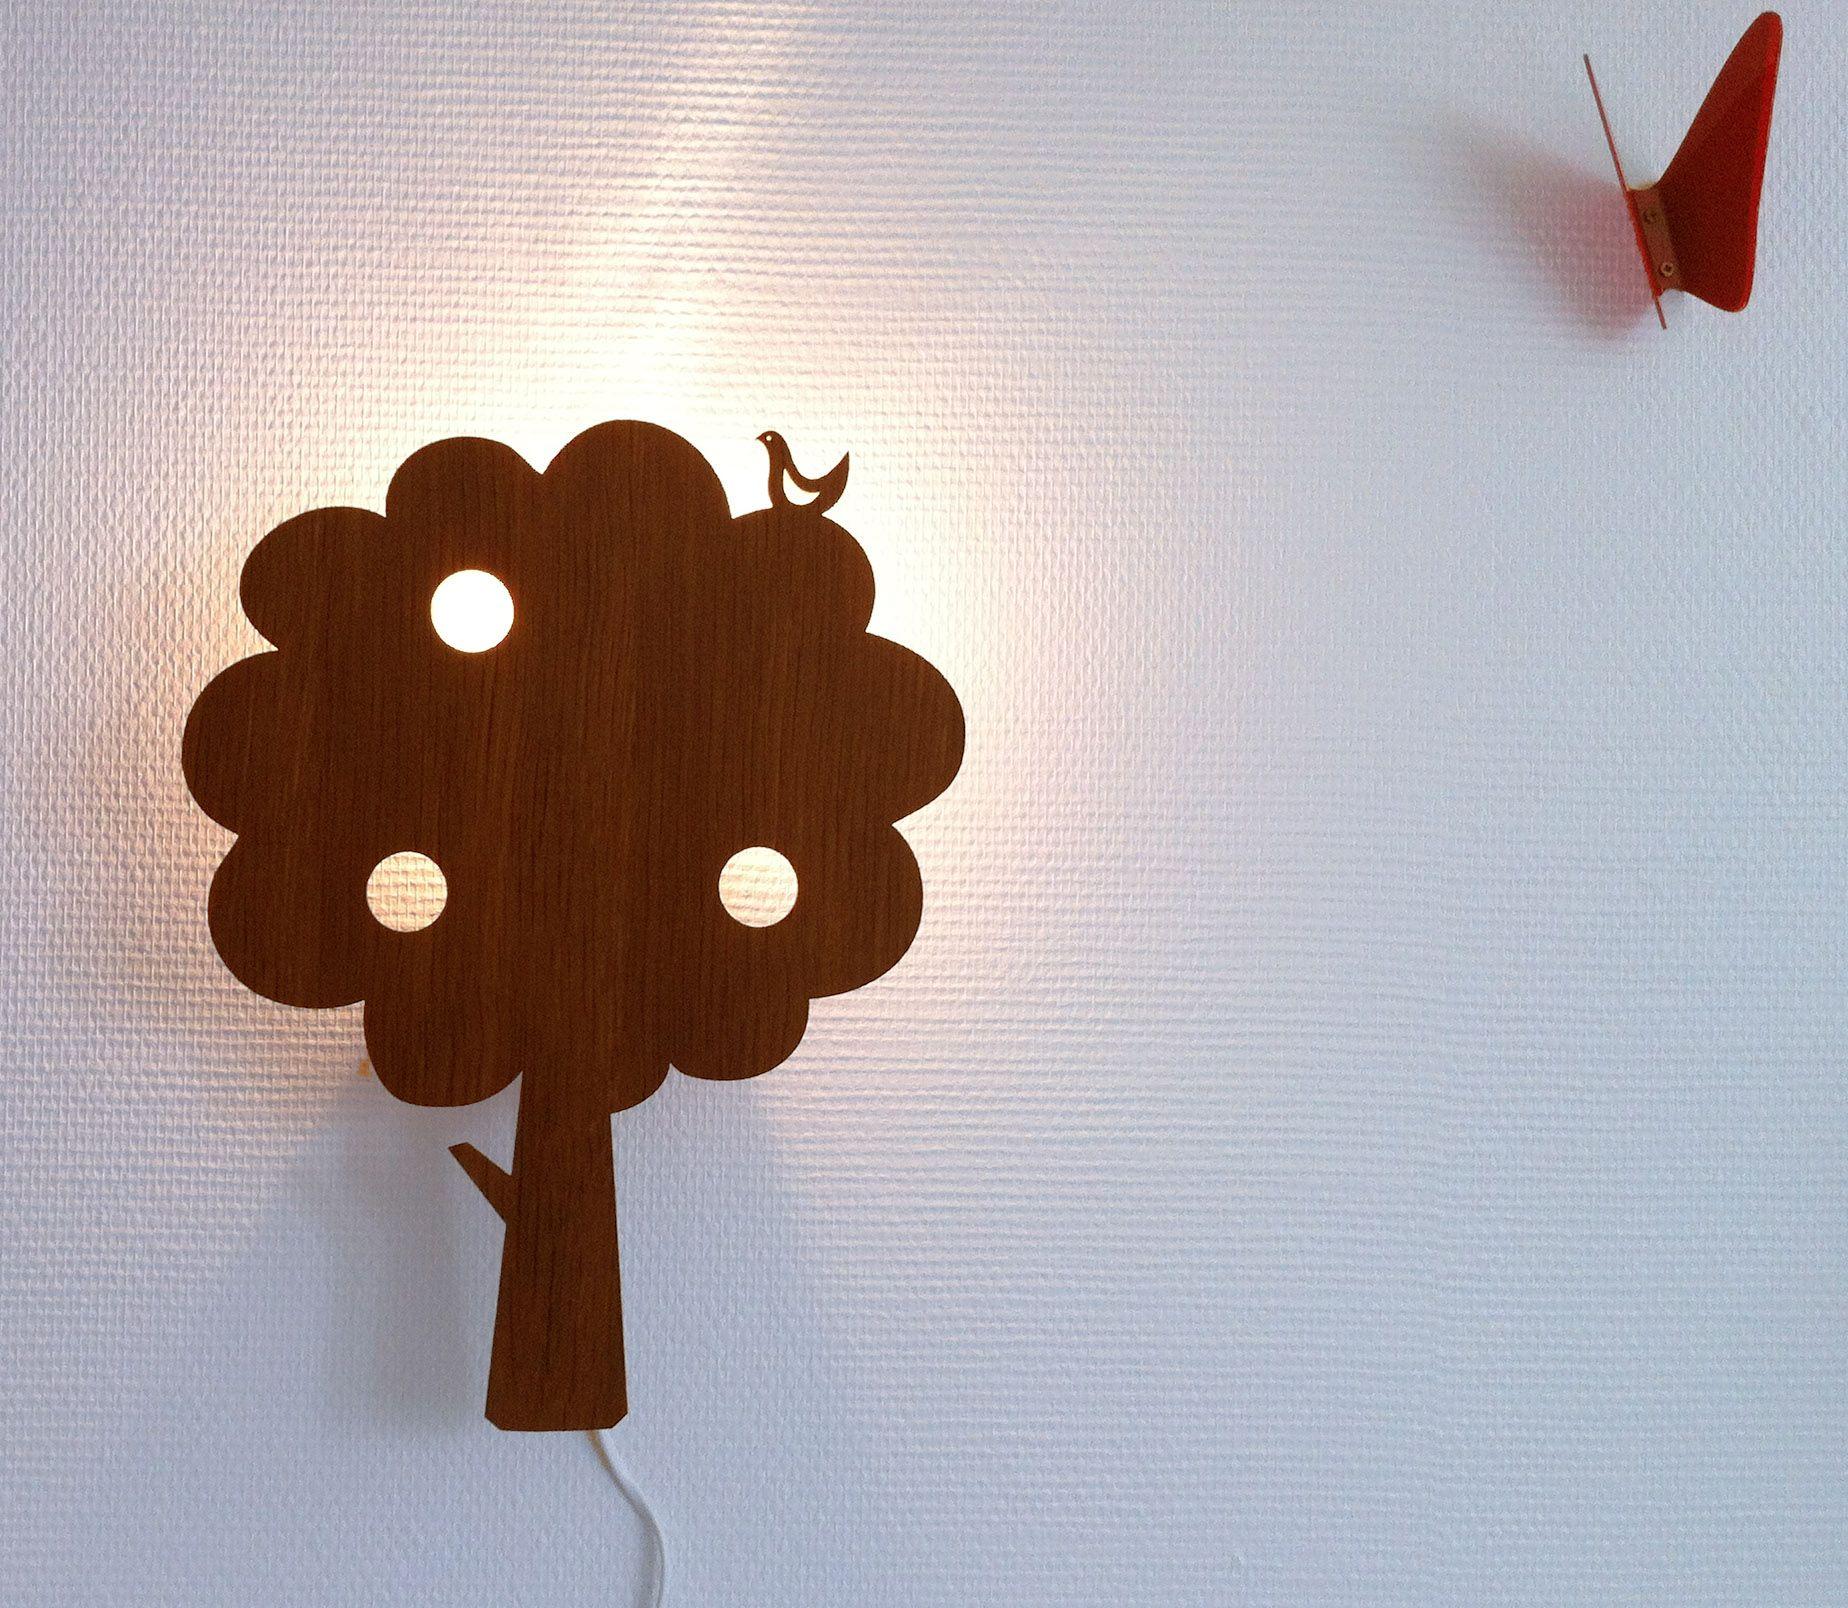 1000 images about deco chambre enfant on pinterest white trees audio system and ballon dor - Applique Chambre Garcon